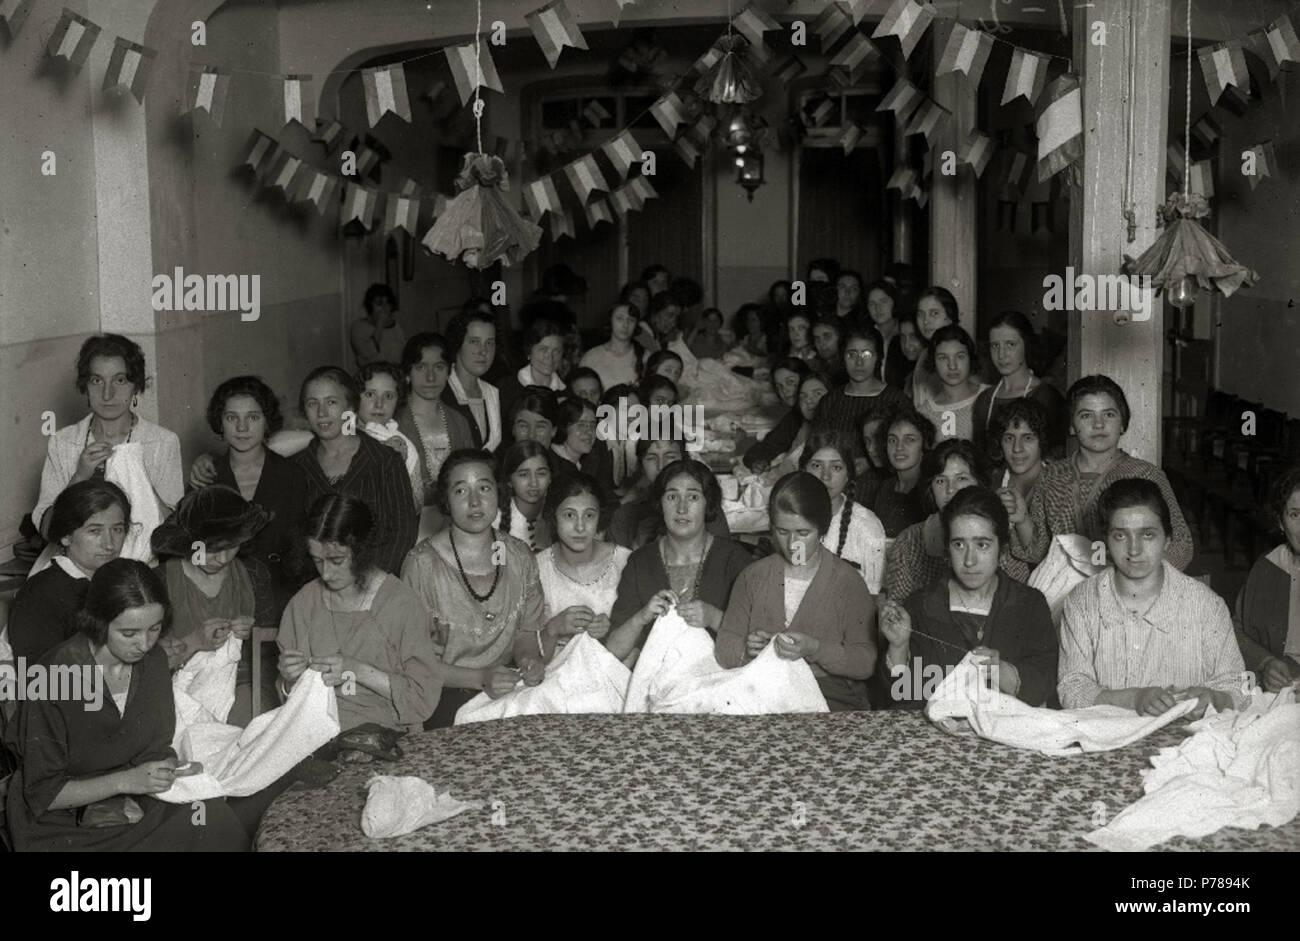 Español: Título original: Grupo de modistas cosiendo (1/1) Localización: Guipúzcoa  . 1921 35 Grupo de modistas cosiendo (1 de 1) - Fondo Car-Kutxa Fototeka Stock Photo